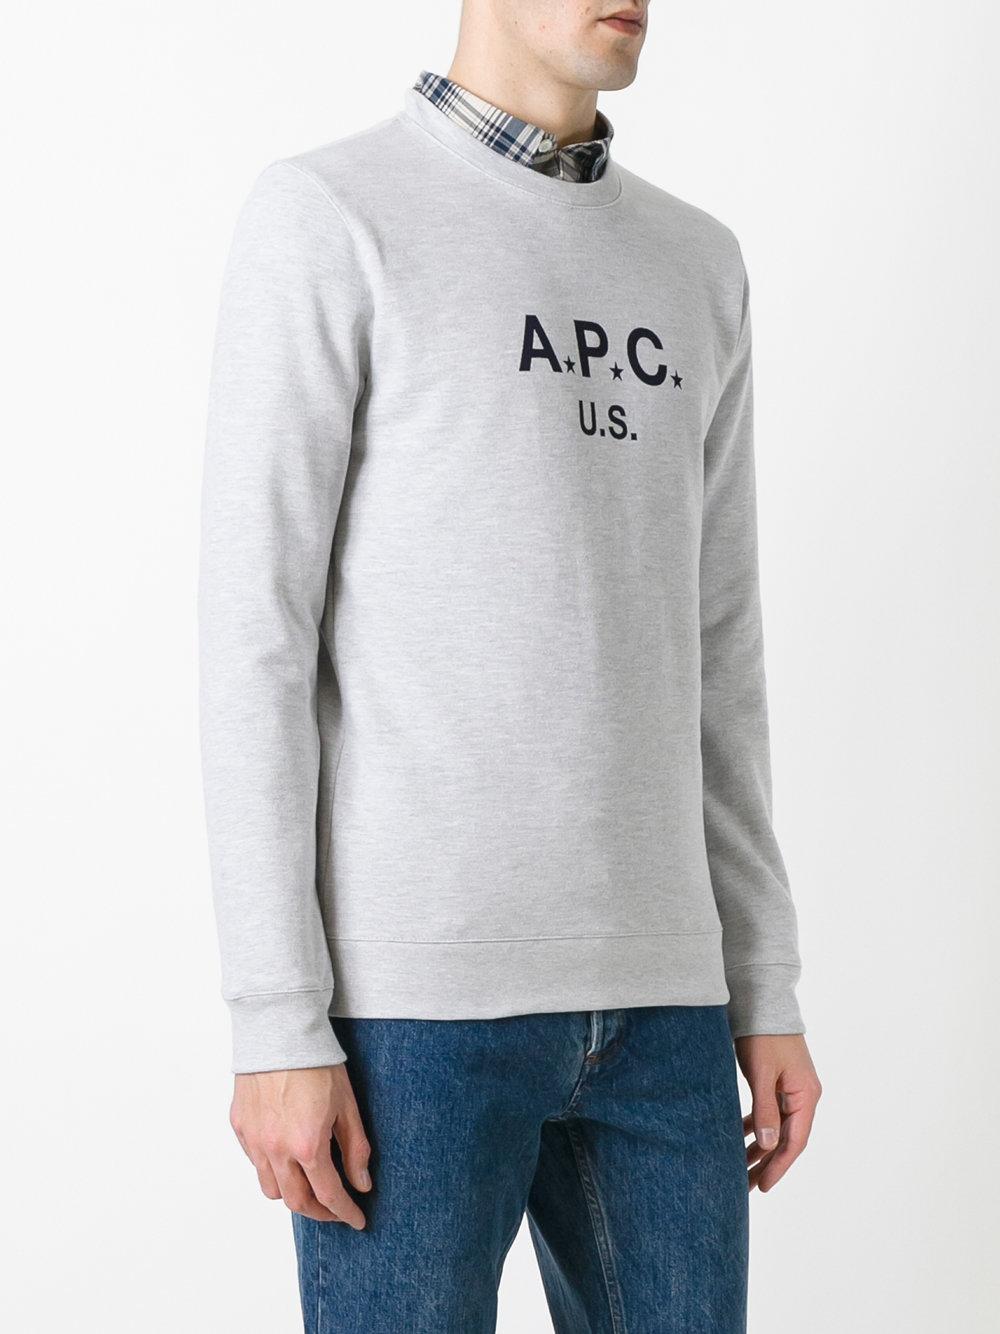 A.P.C. Logo Sweatshirt3.jpg